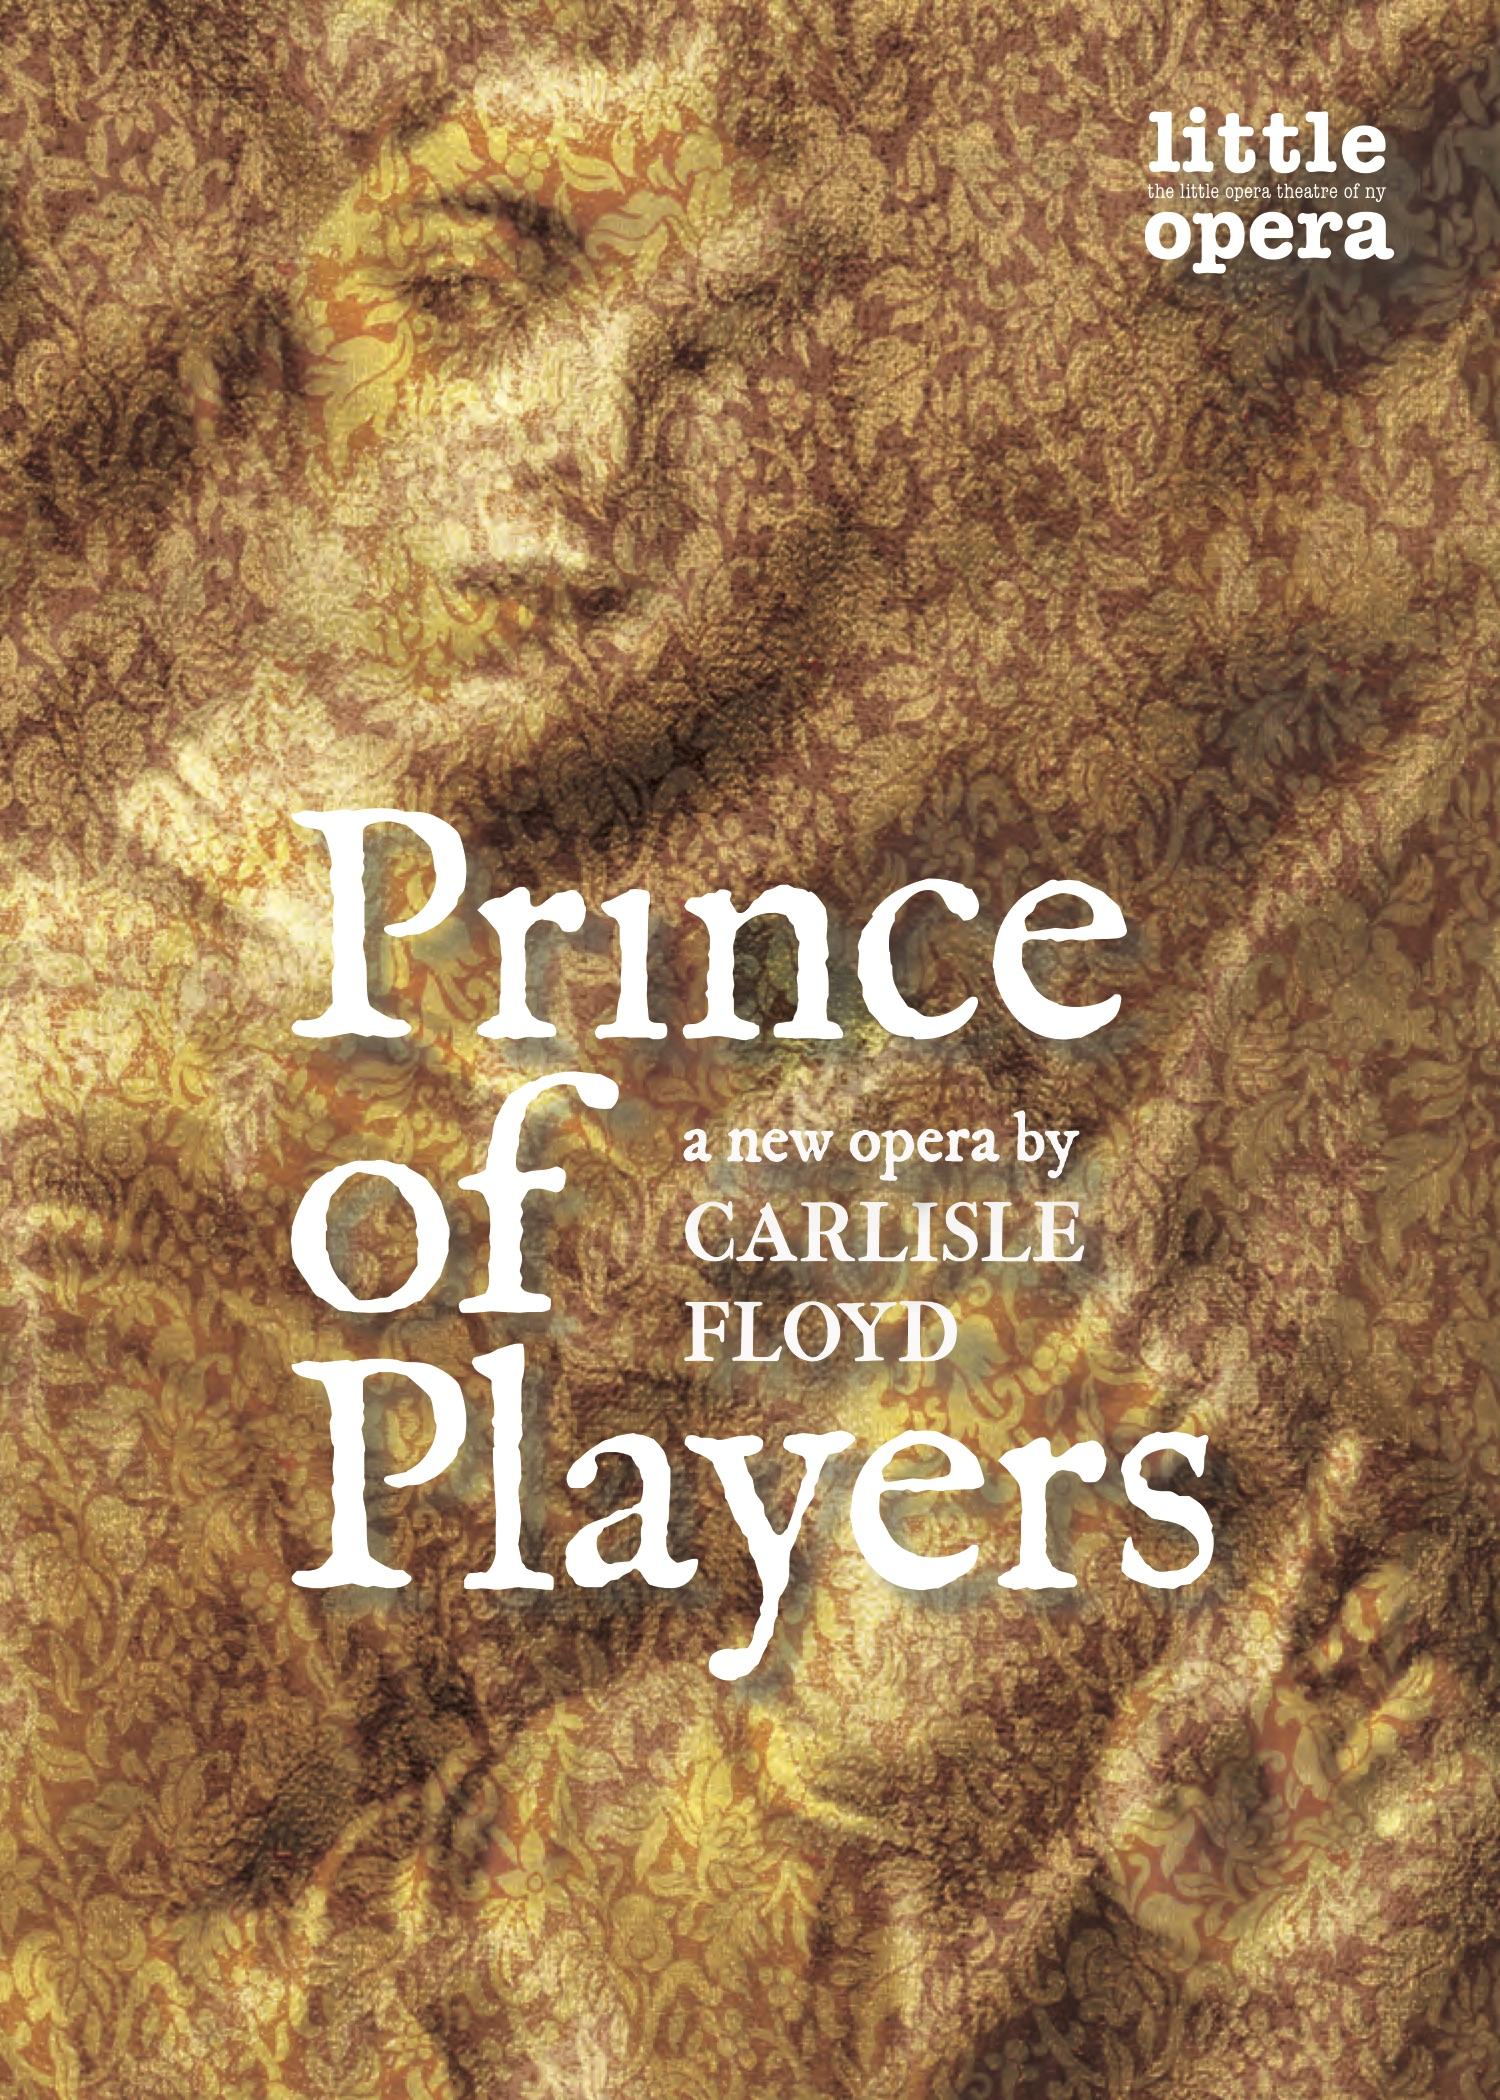 Prince of Players - Opera by Carlisle FloydFebruary 23-26, 2017The Kaye PlayhouseView the program!